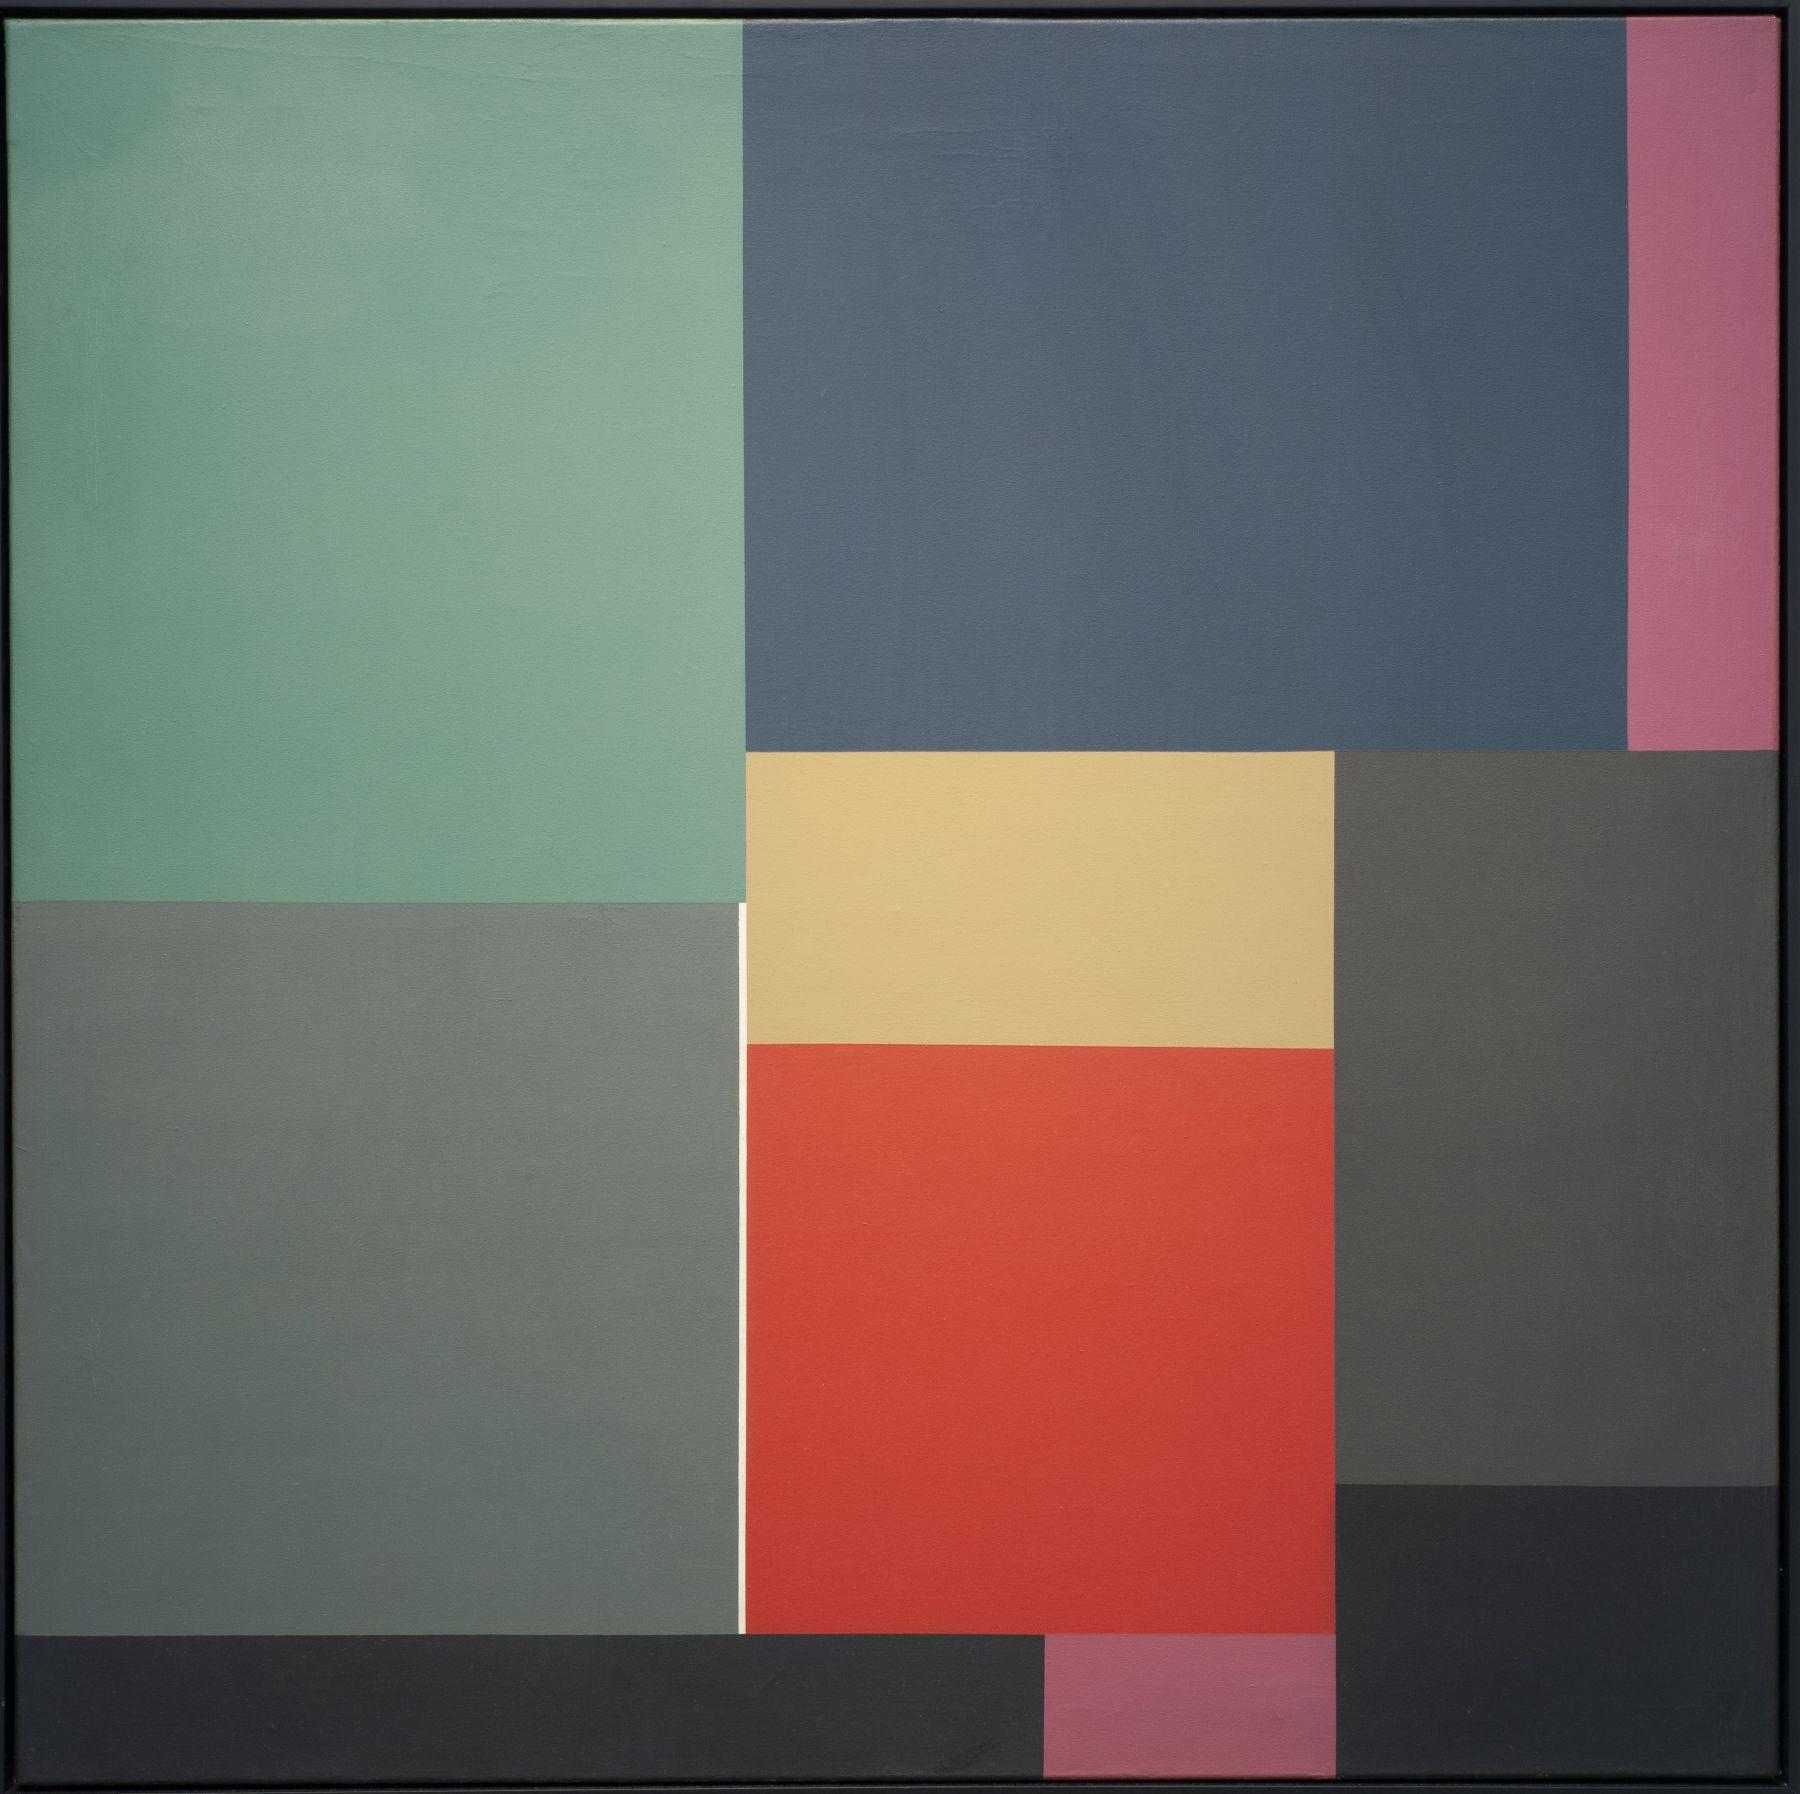 Mercedes Pardo, Untitled, 1976,Acrylic on canvas,47 3/16 x 47 3/16 in. (120 x 120 cm.)